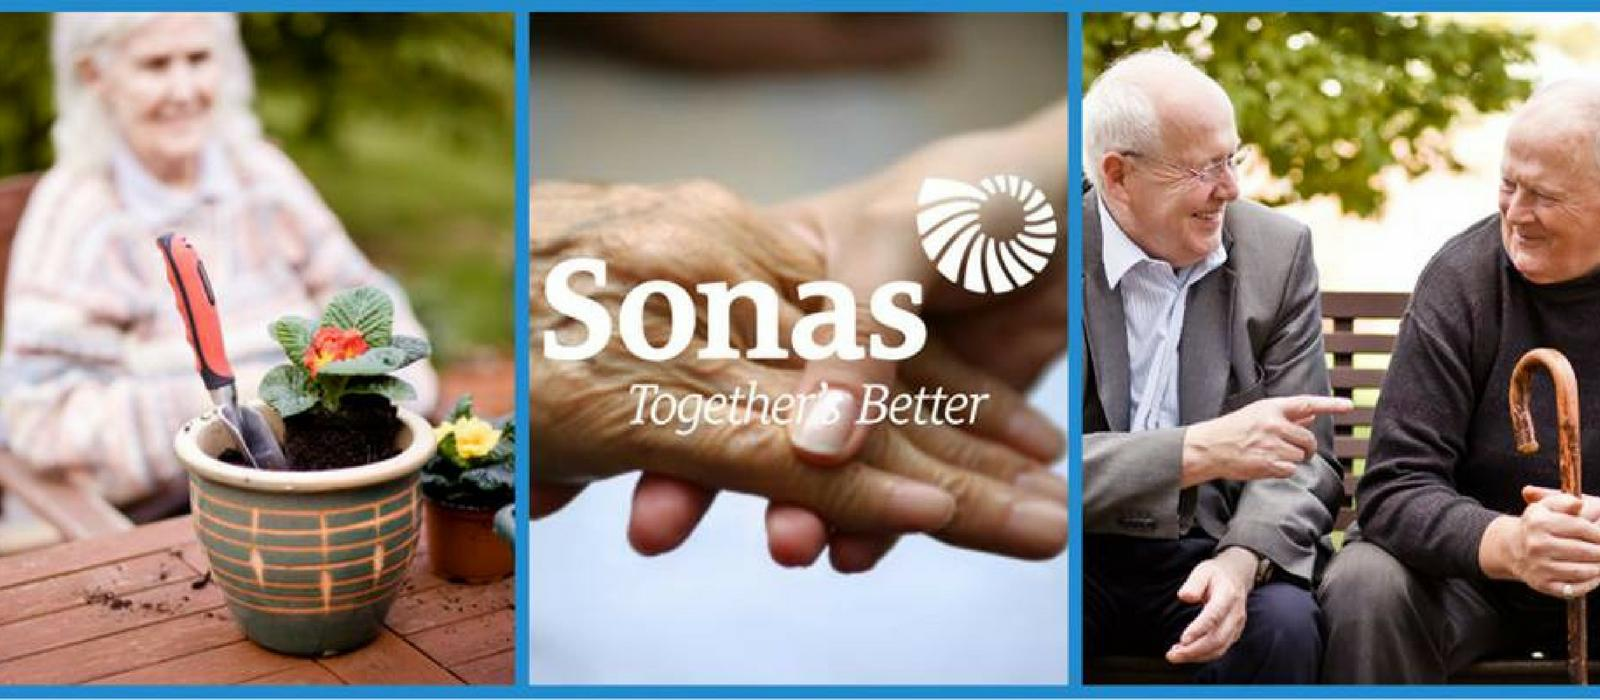 Sonas Nursing Home Jobs